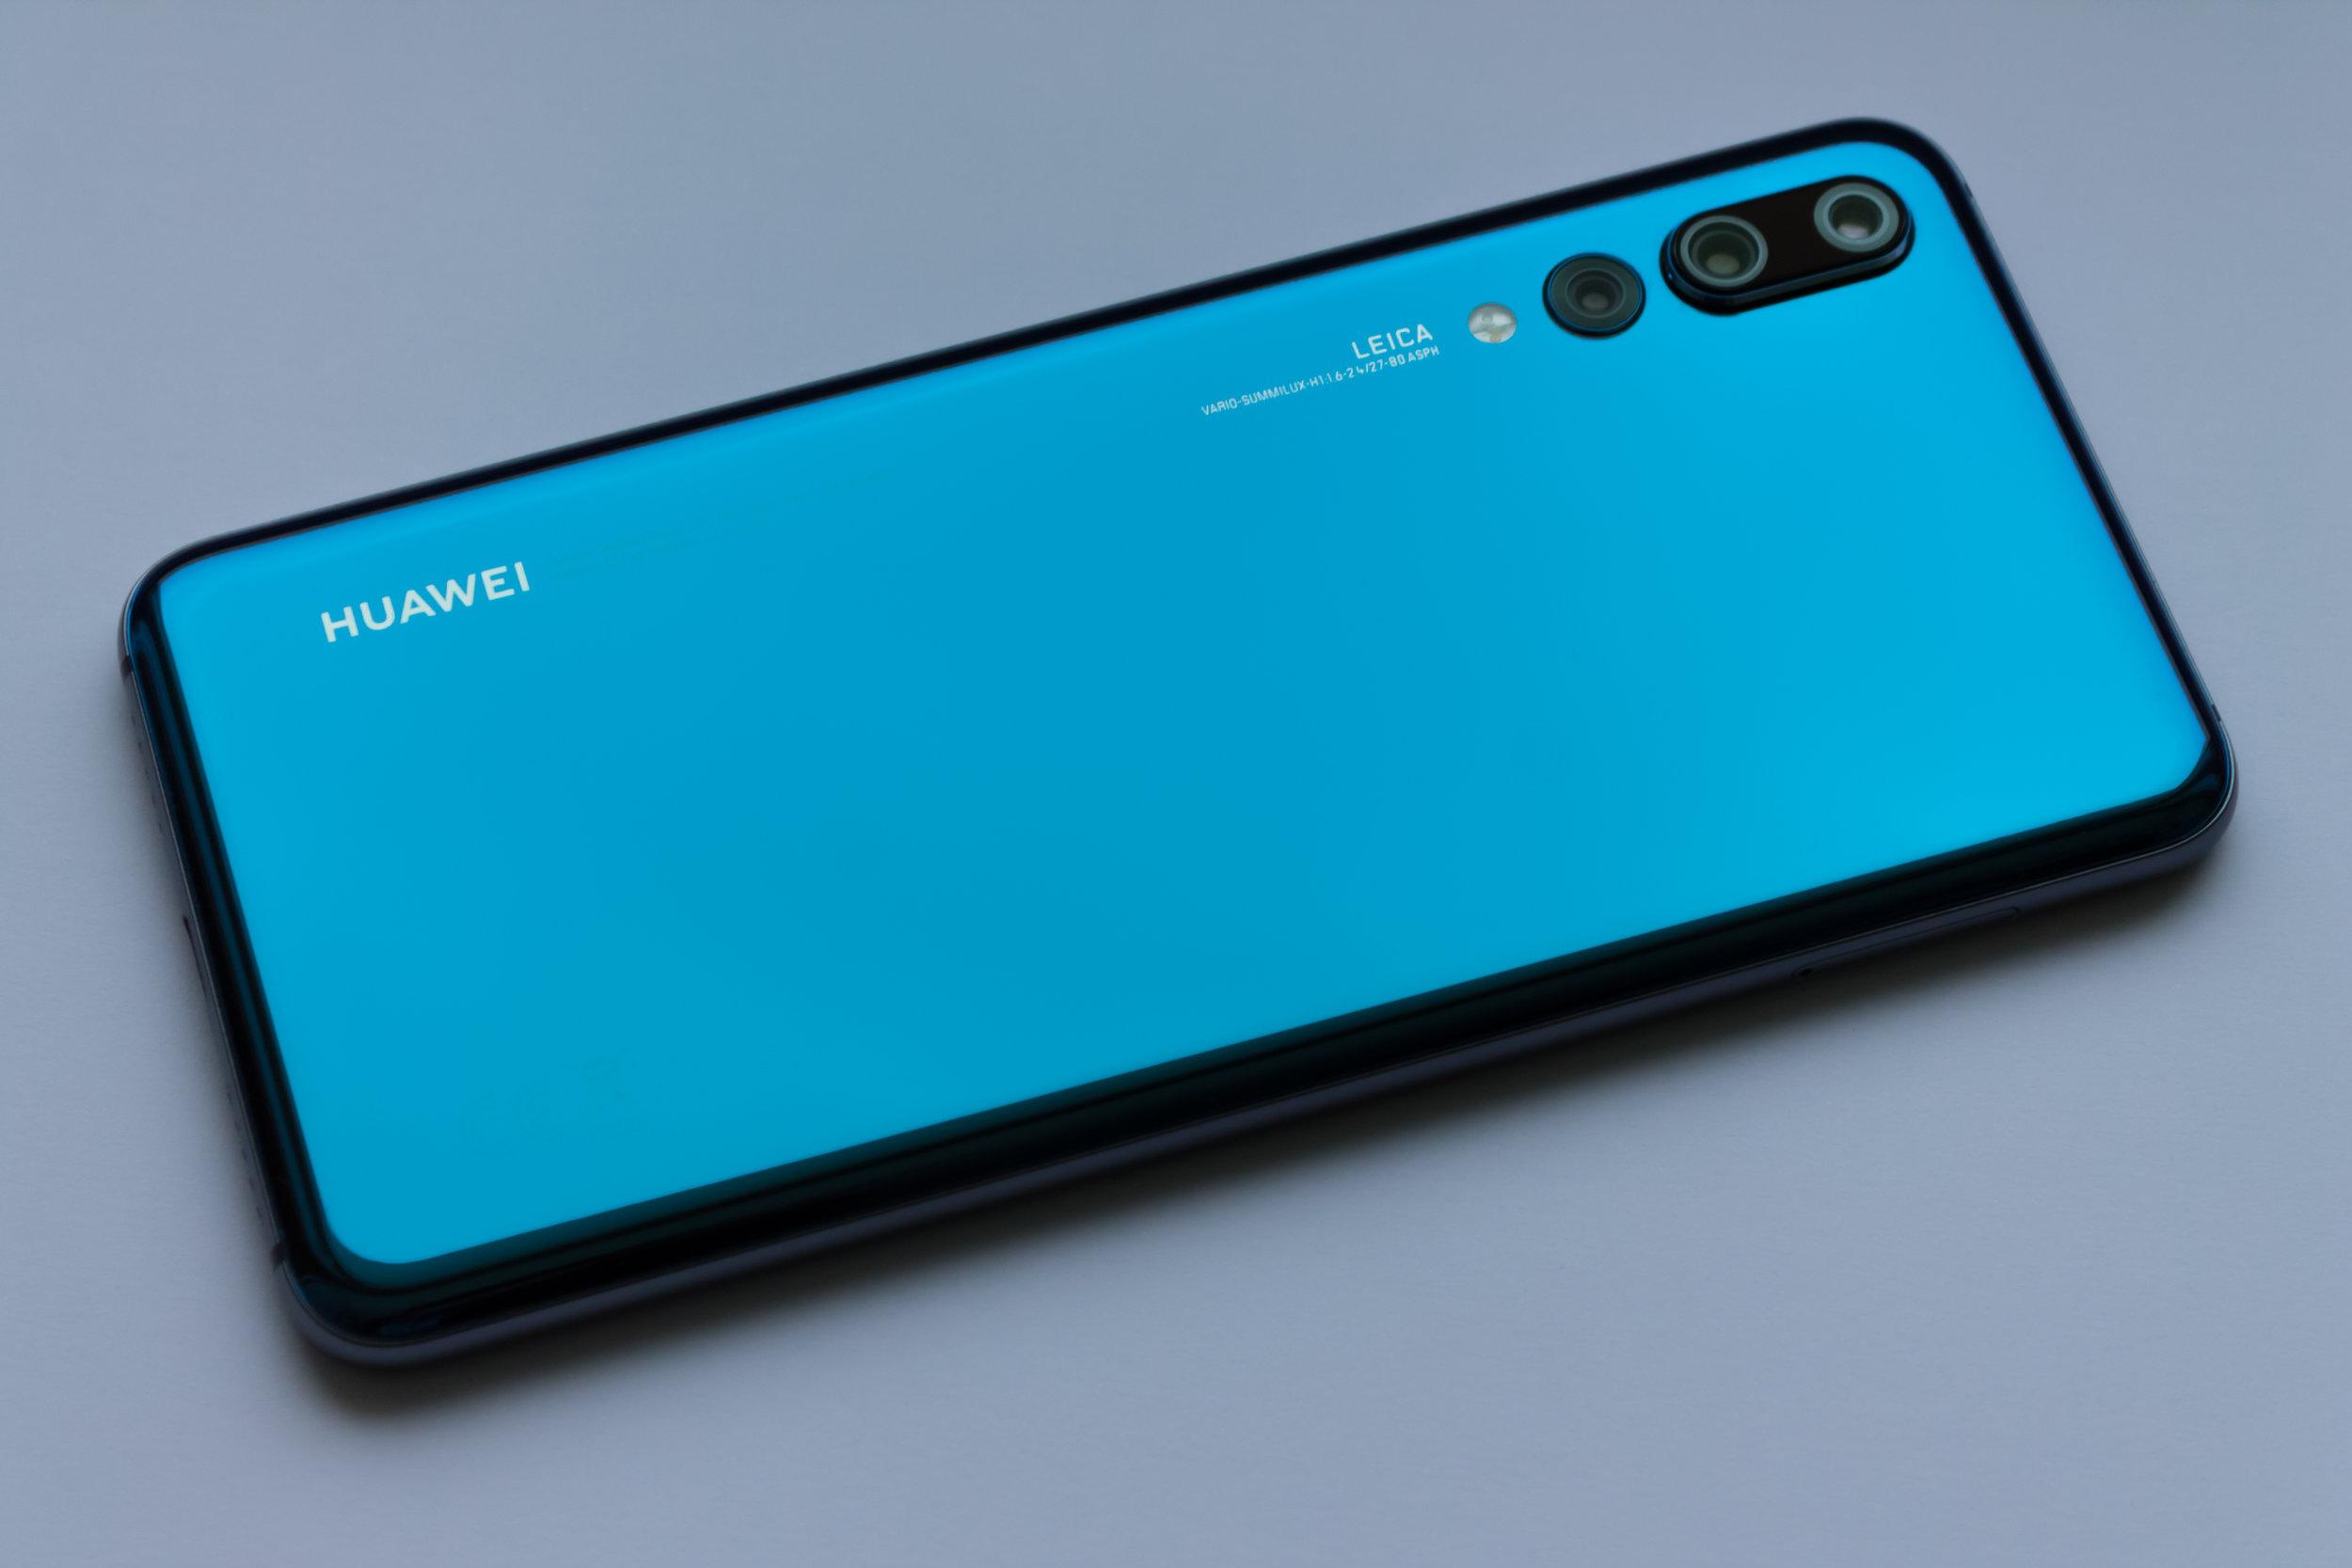 Telefono Huawei. Foto: Kamil kot/Unsplash/La Crónica SV